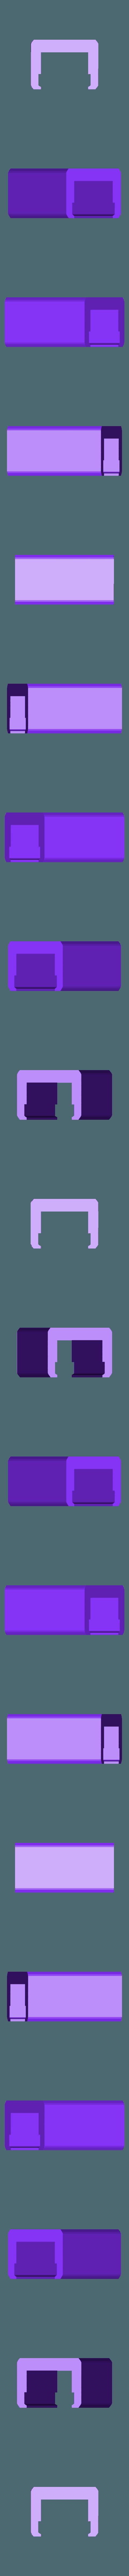 iphonealarmdockv2_fixed.stl Download free STL file iPhone Alarm Dock • 3D printable template, Ilourray